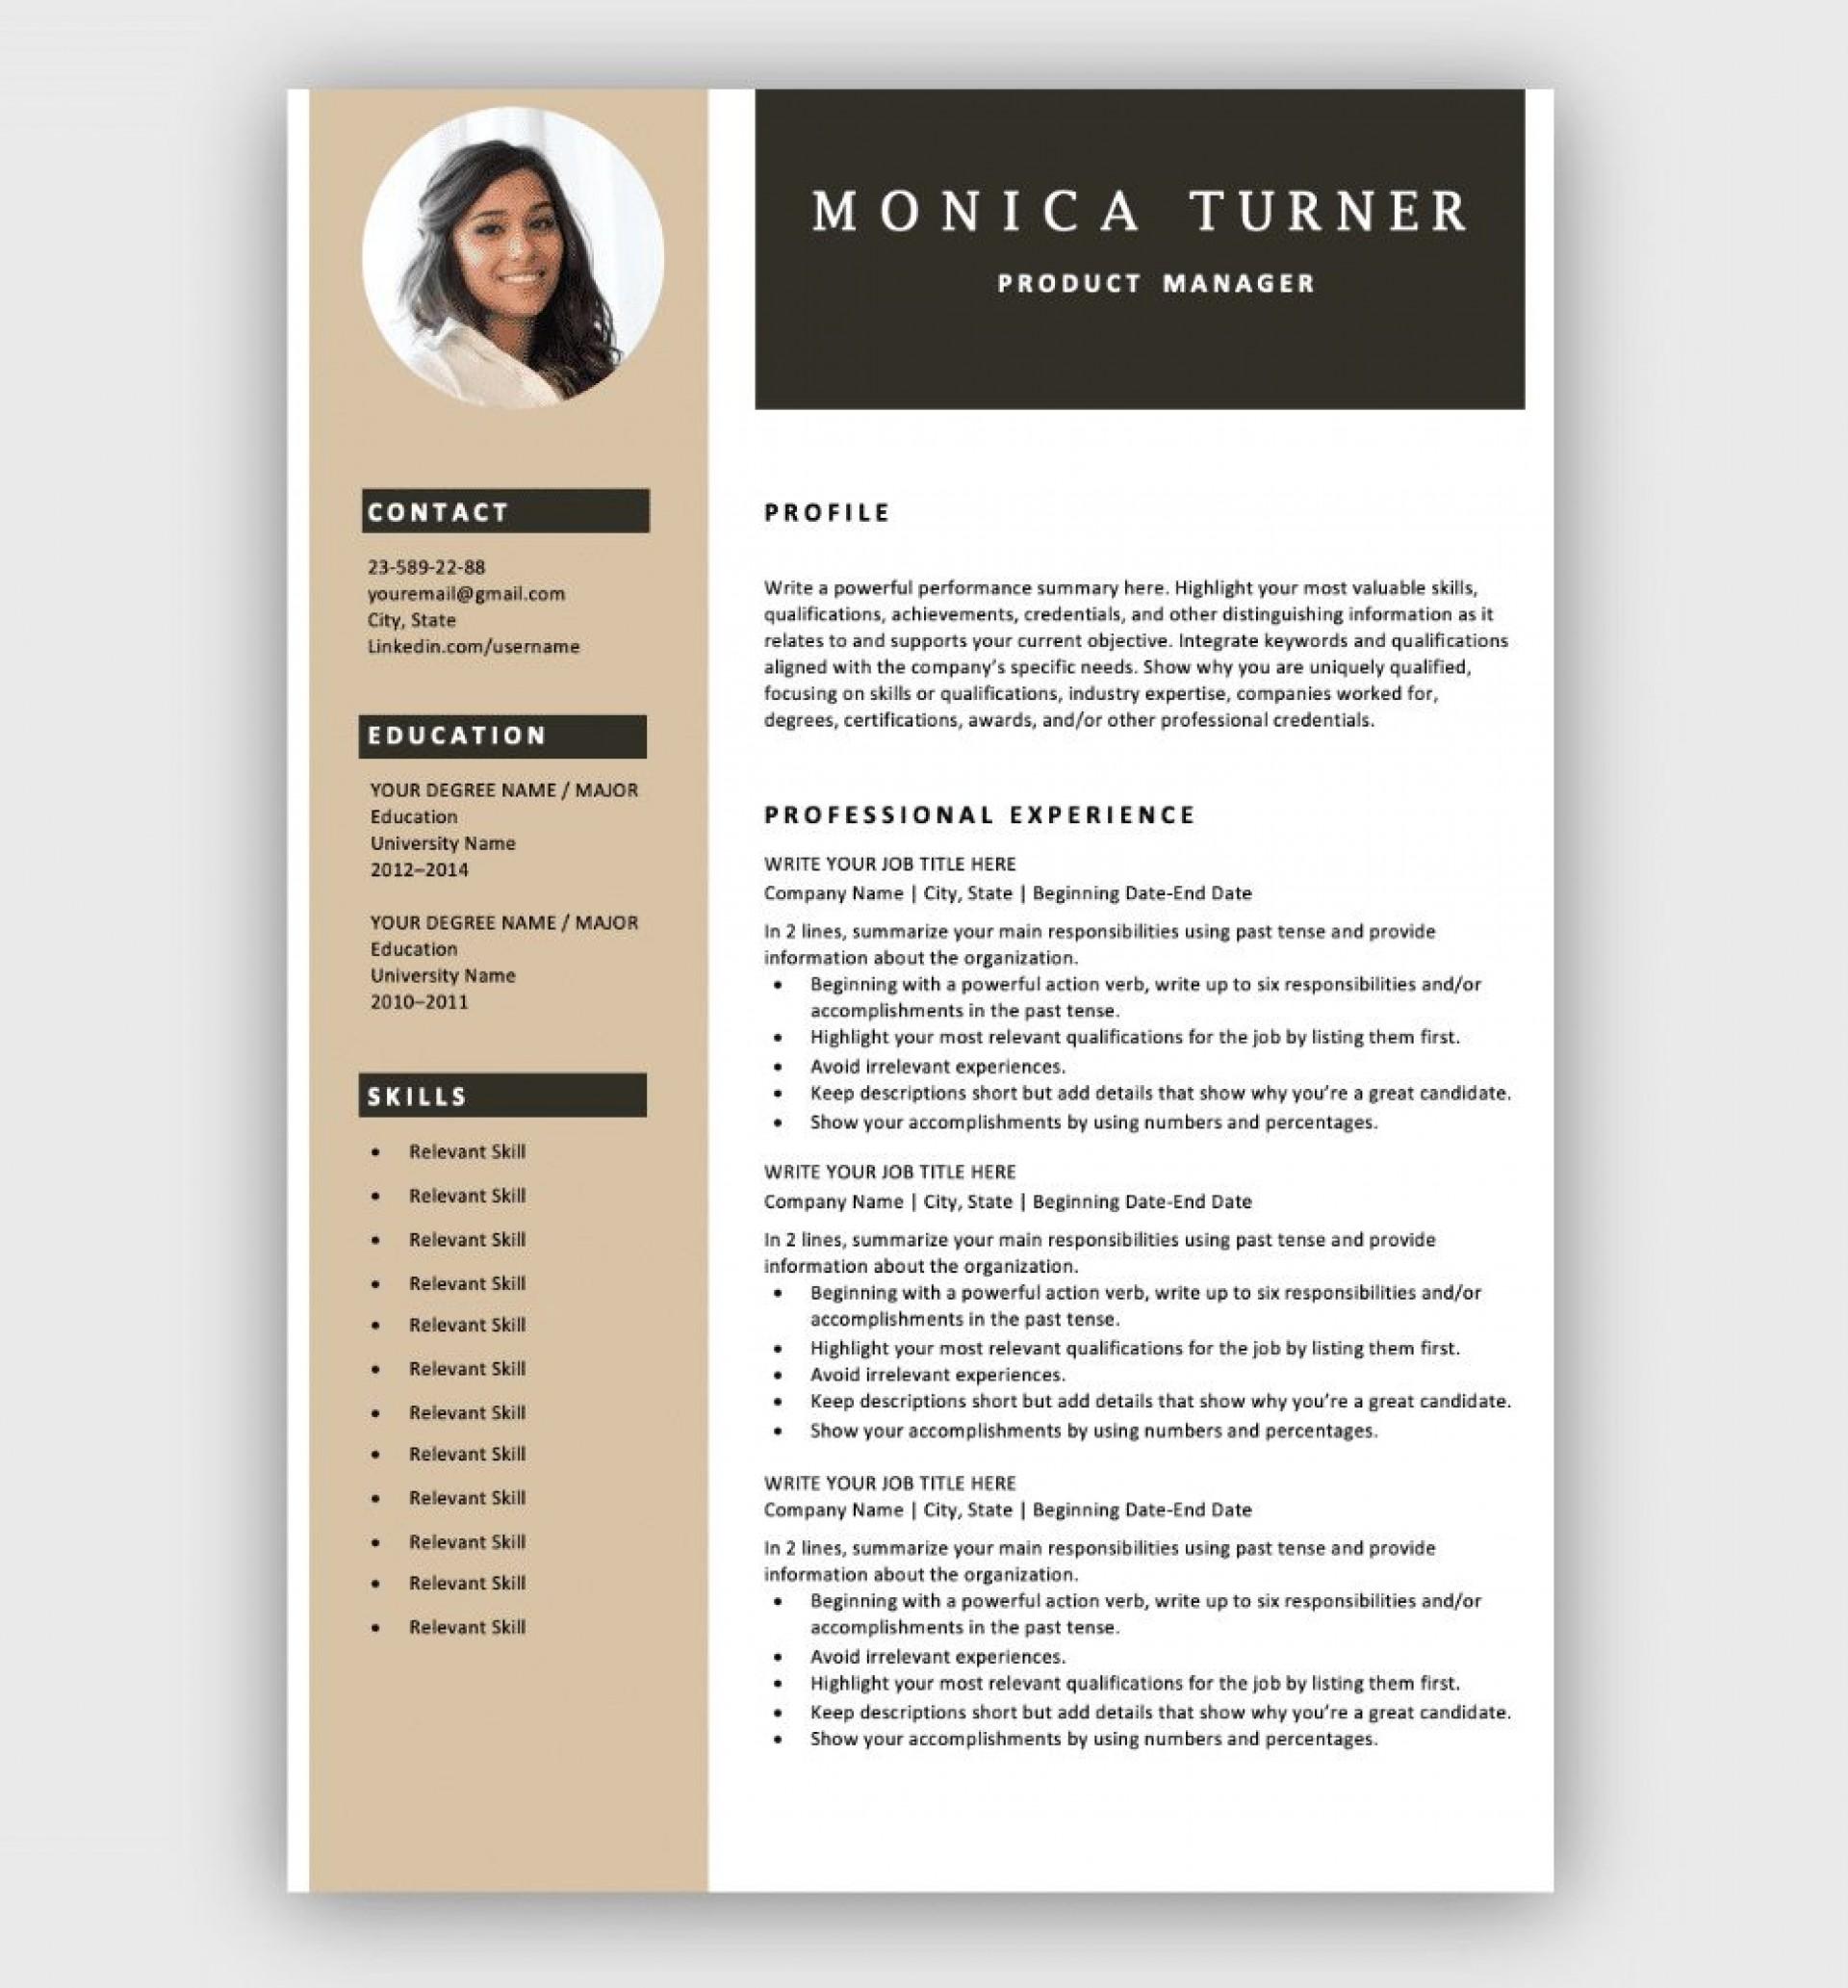 002 Shocking Free Resume Template Microsoft Word Idea  2007 Eye Catching Download 20101920